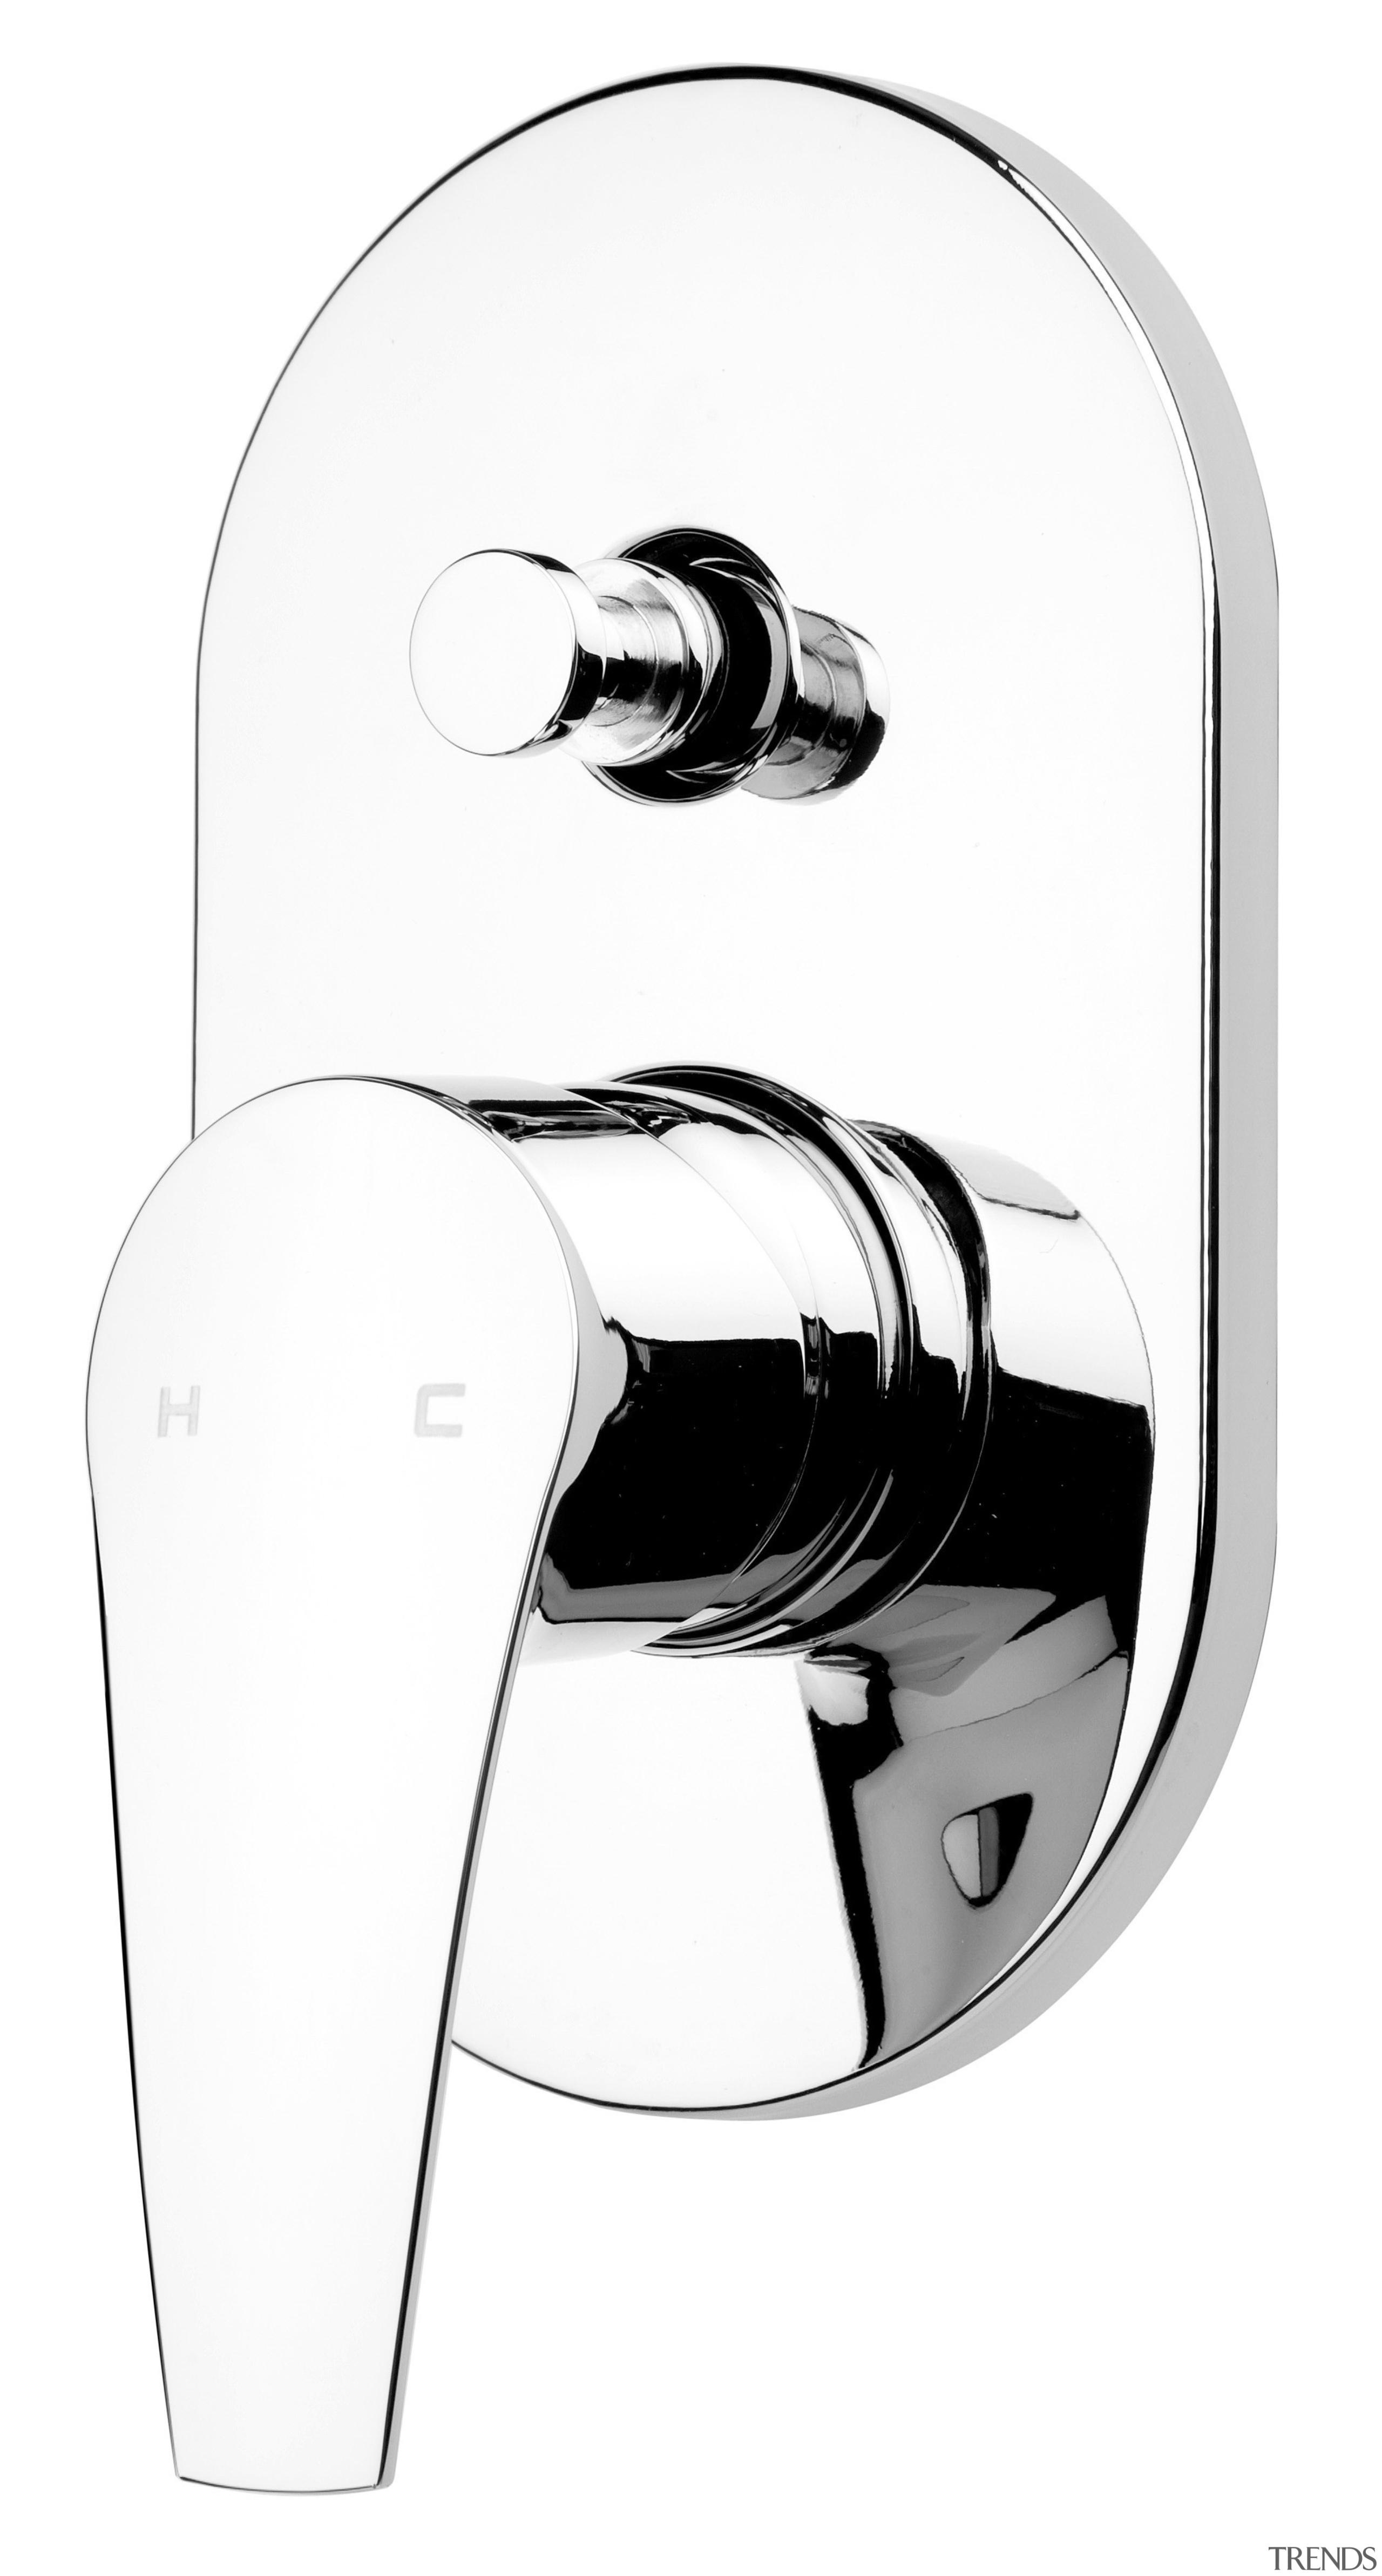 Ecomix Diverter Shower Mixer VECM035 - Ecomix Diverter black and white, plumbing fixture, product, product design, tap, white